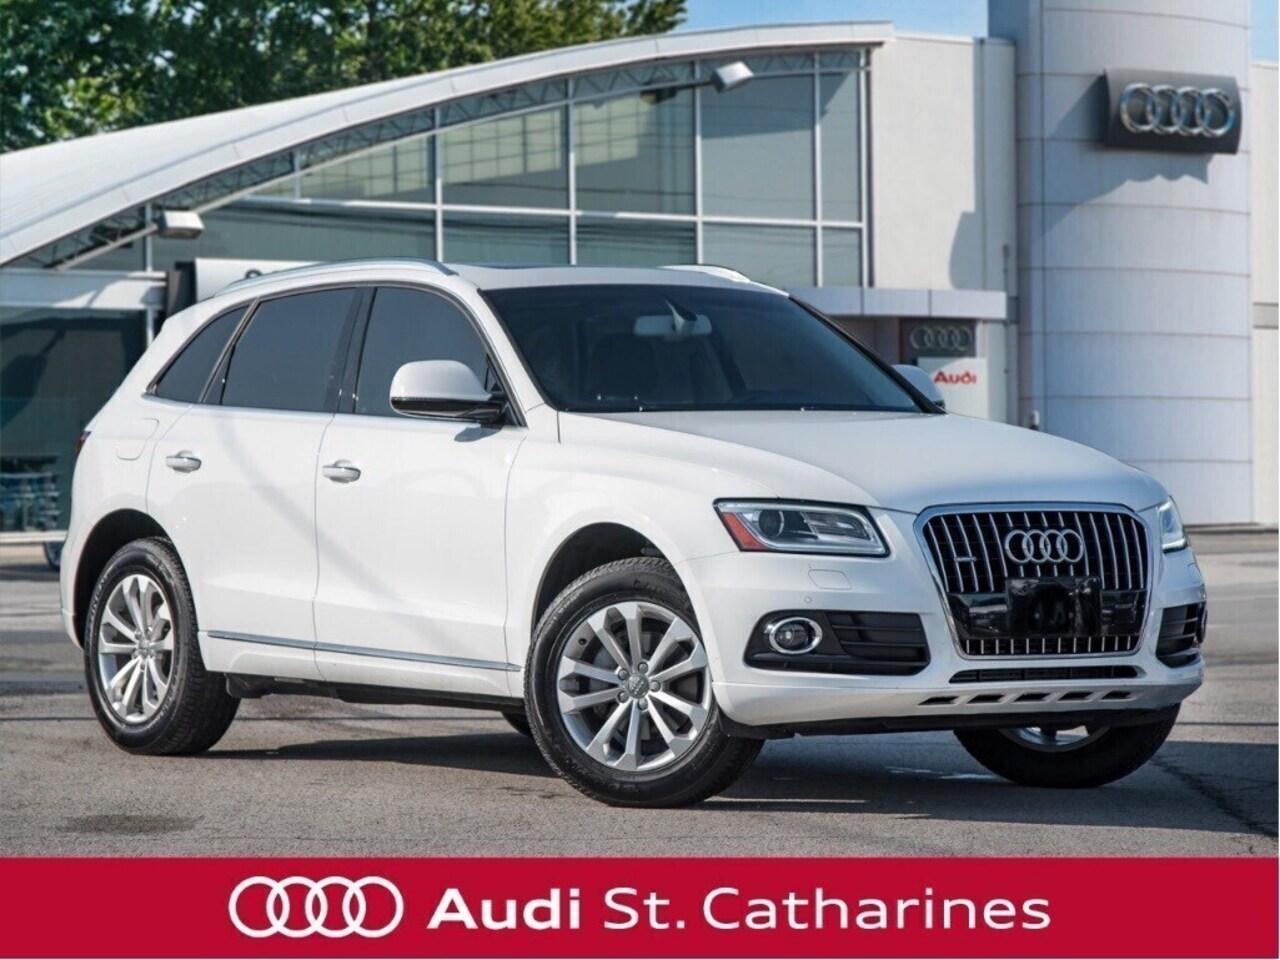 2016 Audi Q5 AUDI CERTIFIED: PLUS! 1 OWNER - NAVI ! SUV